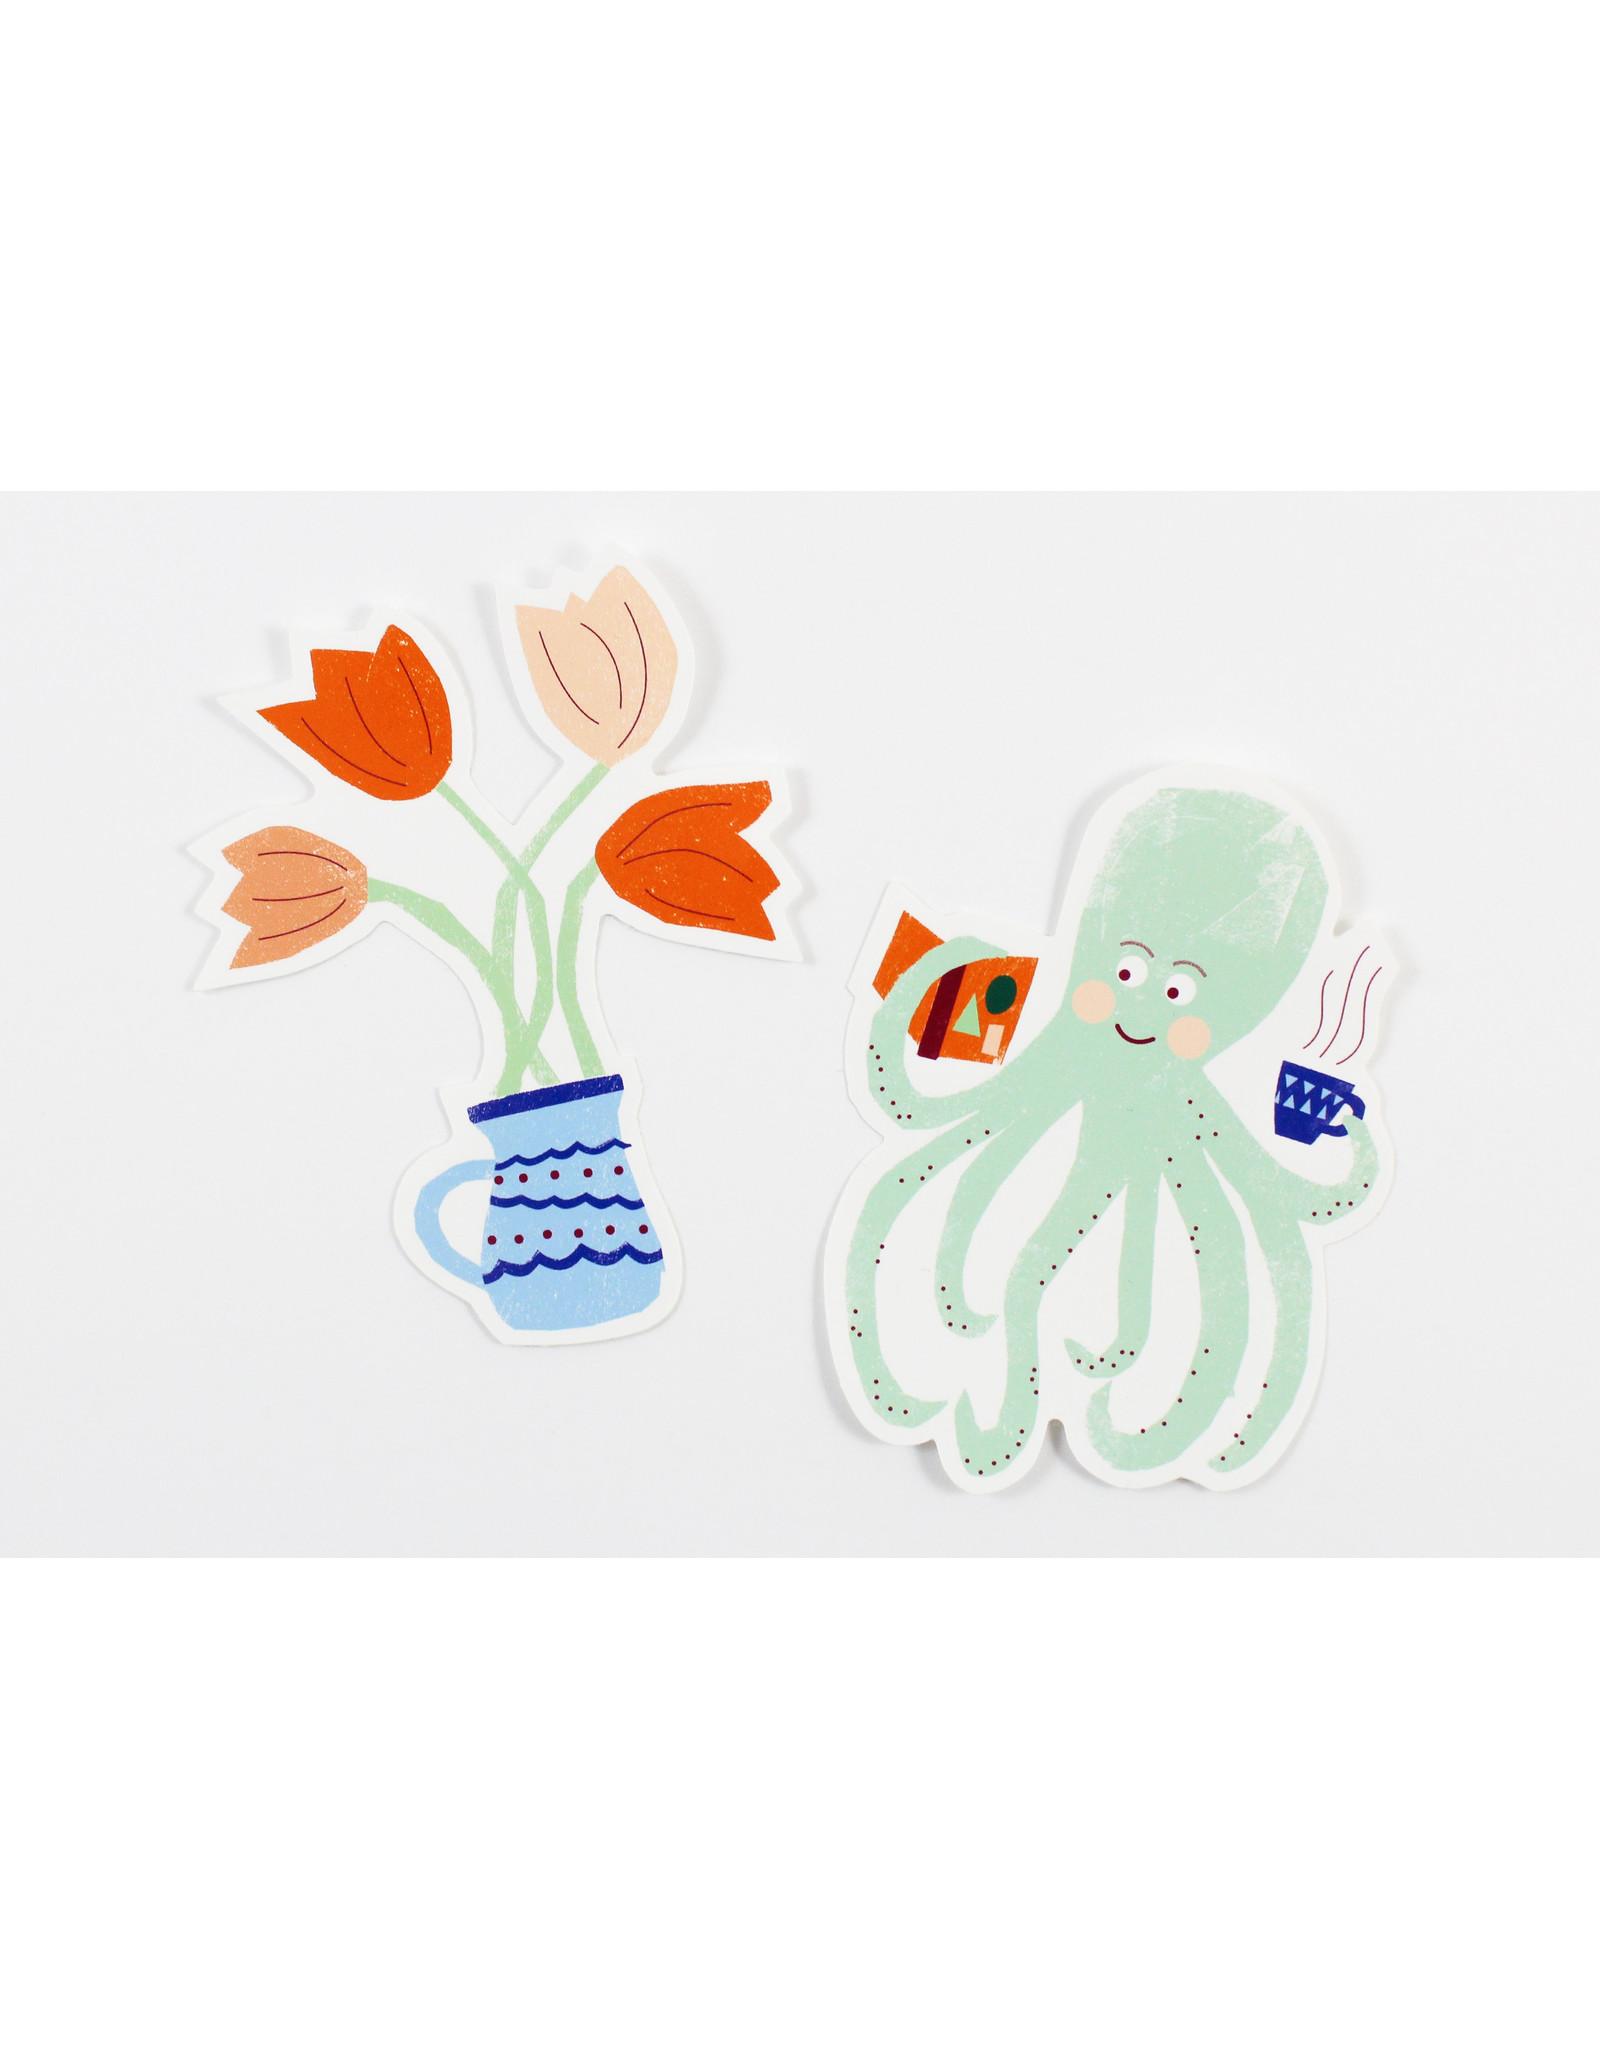 Patrizia Monnerjahn Illustrated Stickers by Kautzi